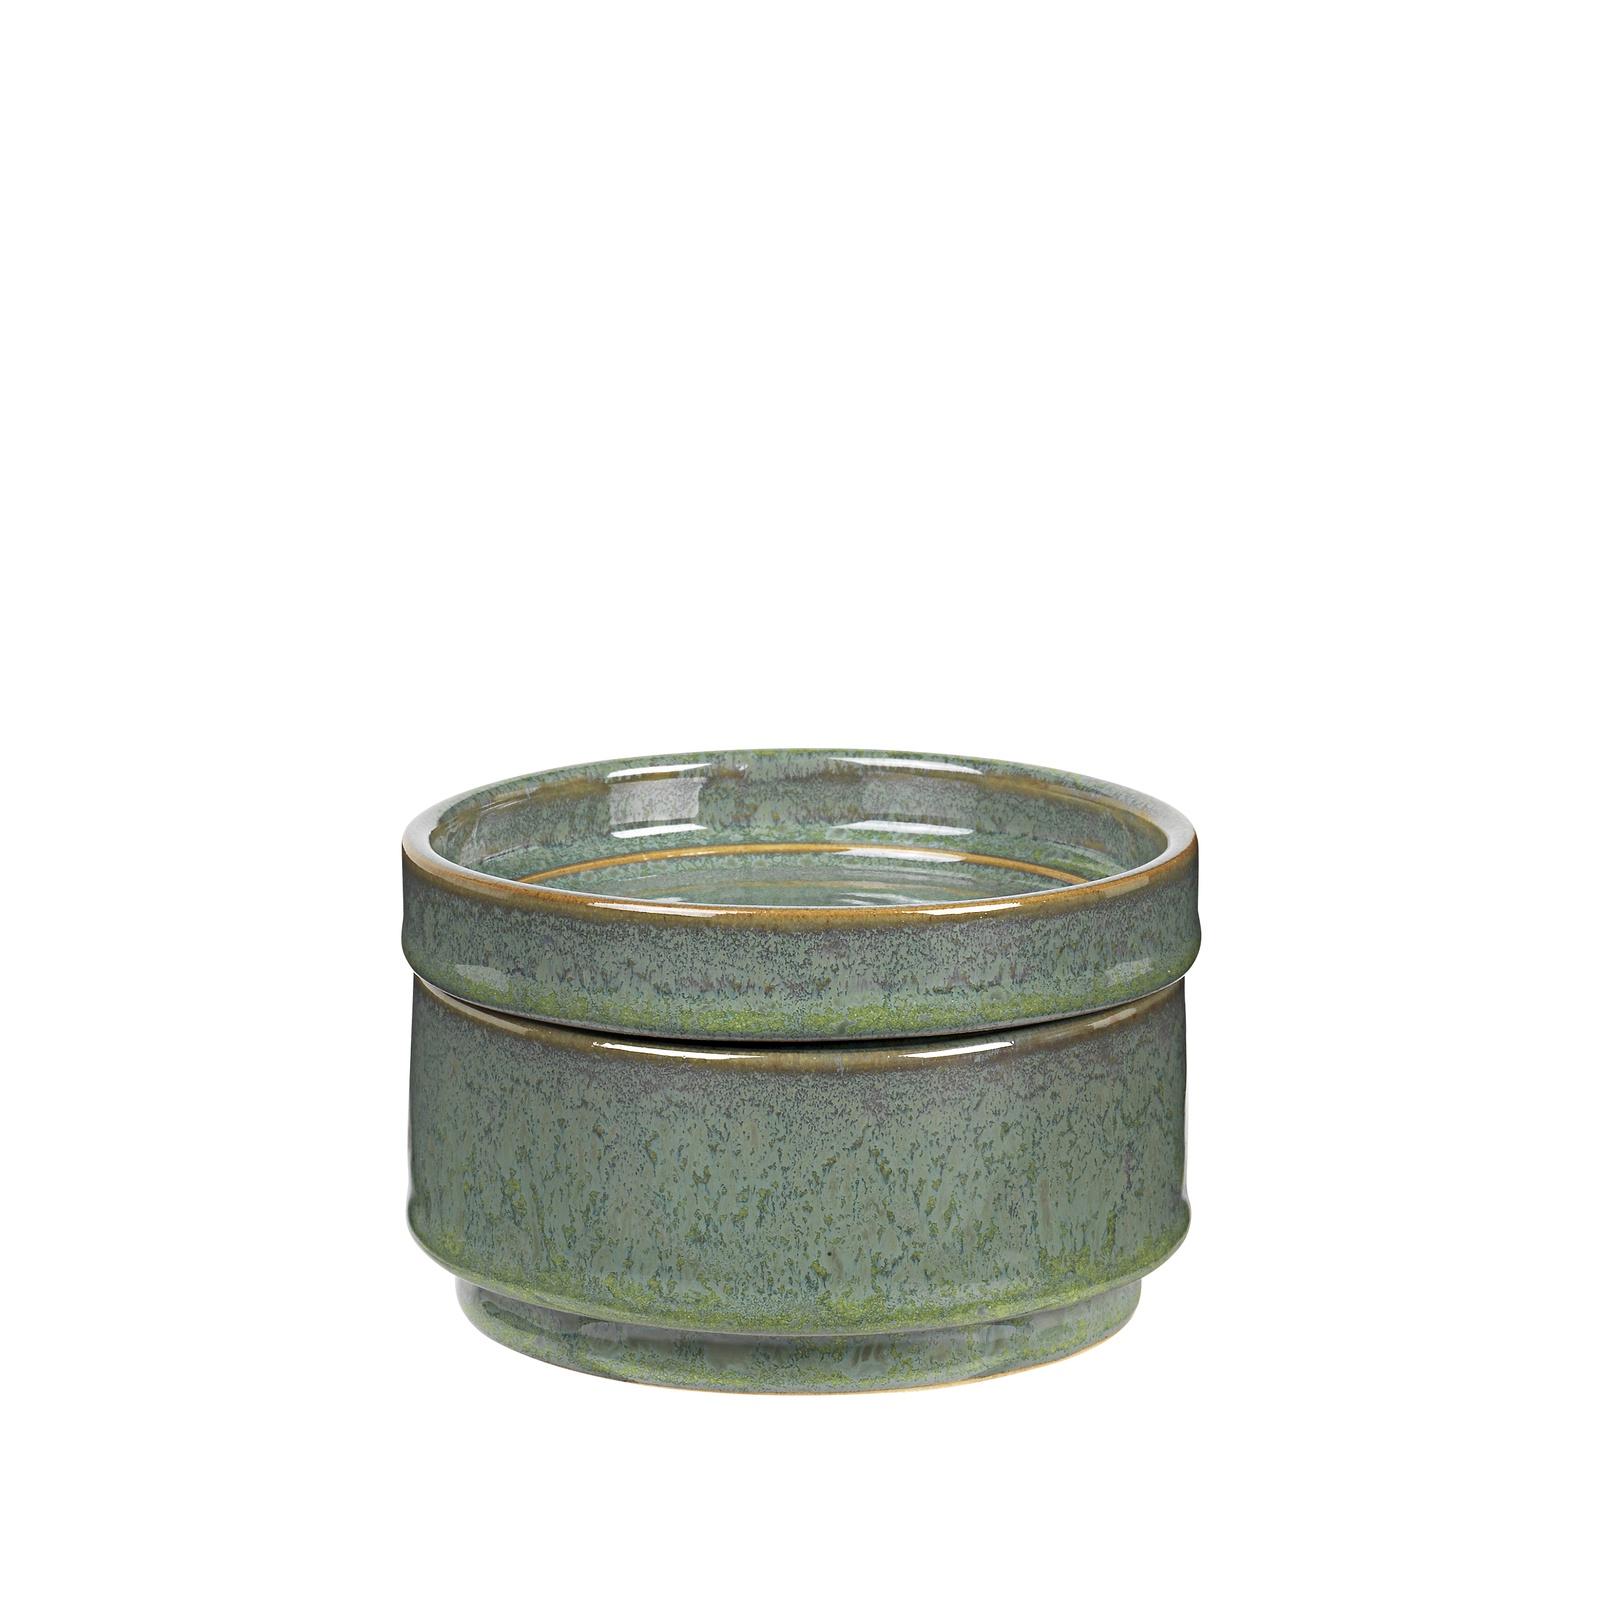 Шкатулка Broste Annie, 15500272, керамика, 12 х 12 х 7.5 см цена